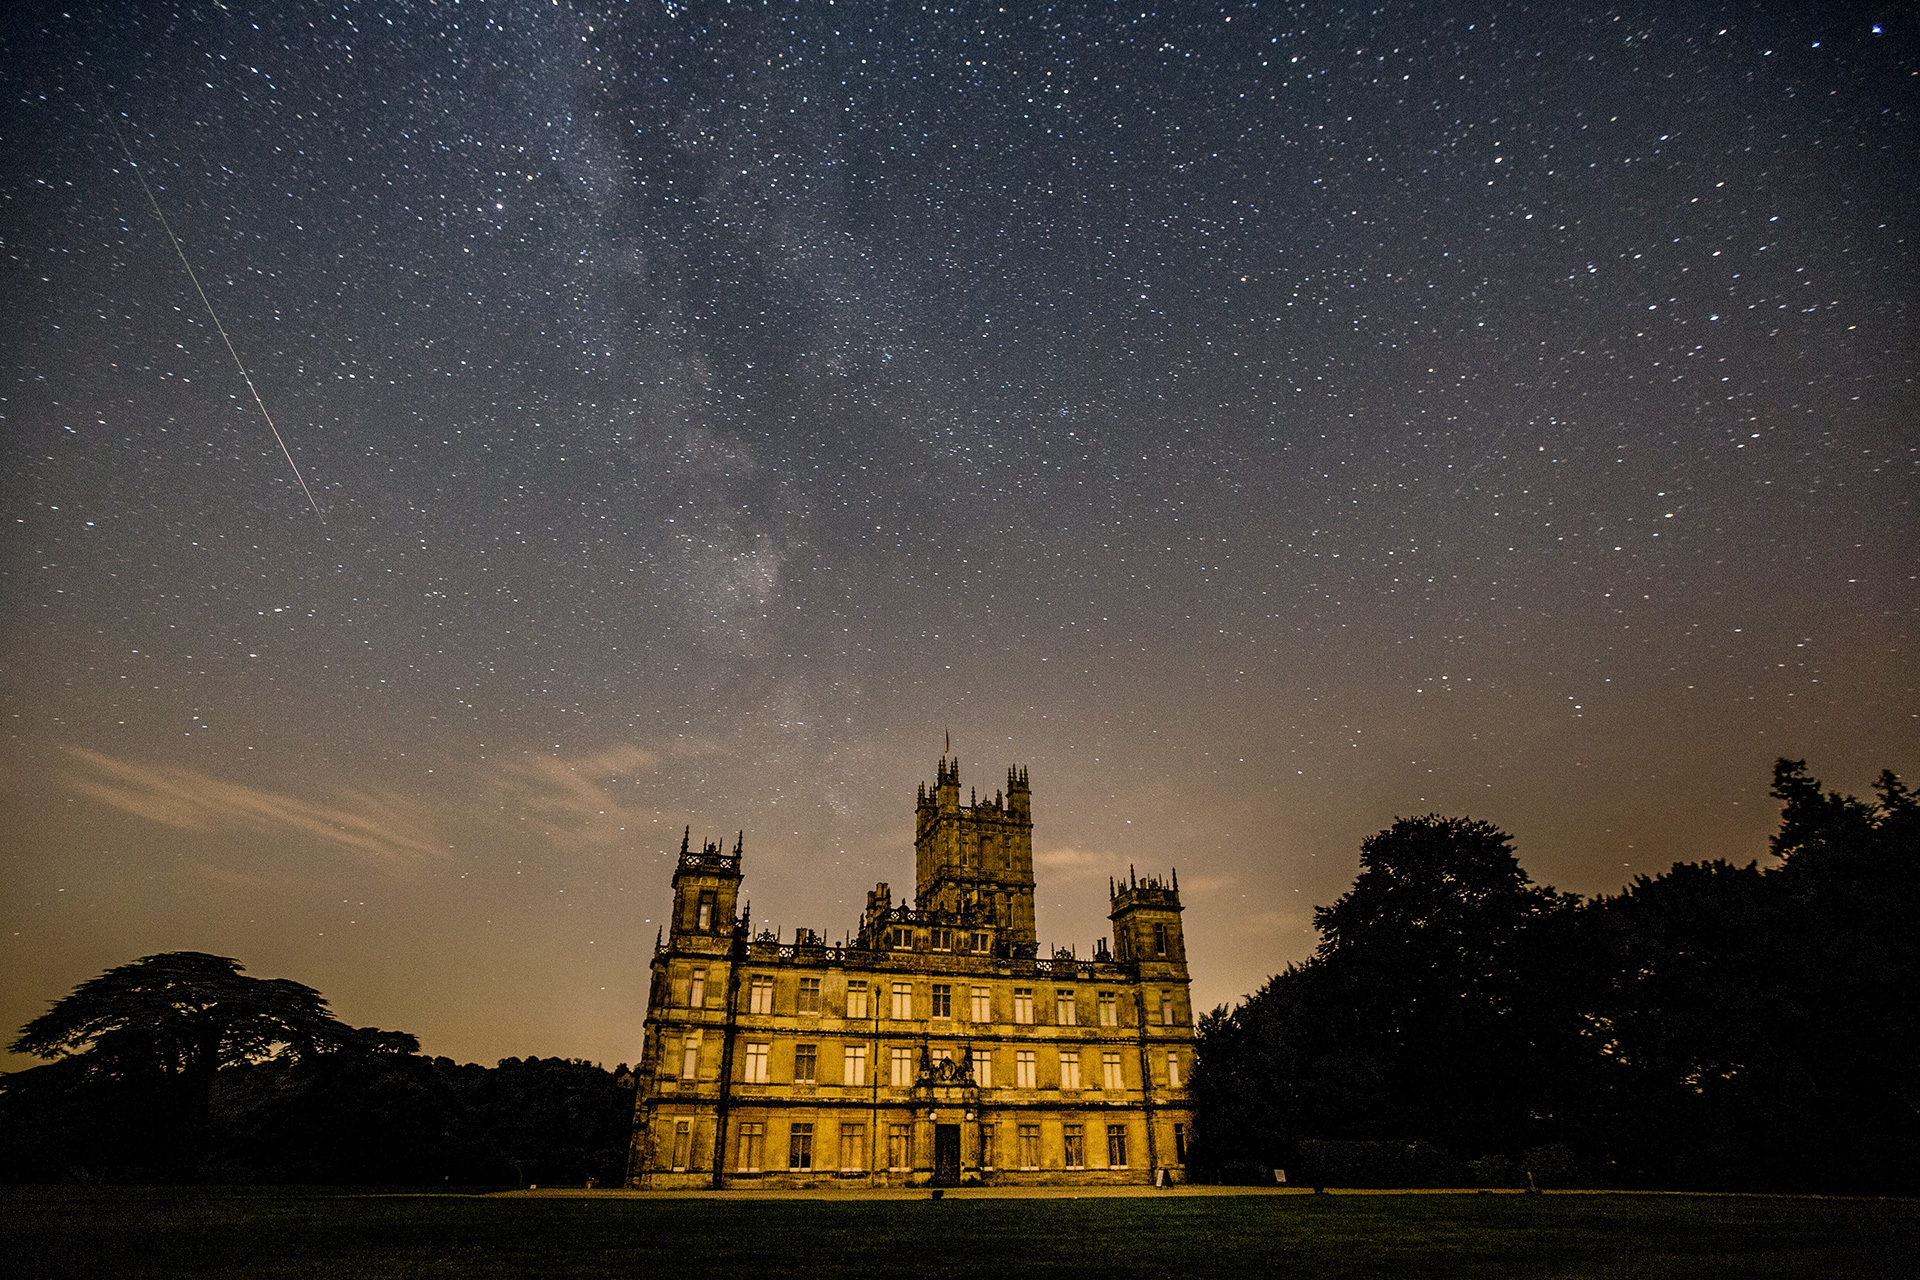 Castle Downton Abbey di Notte - Neomag.